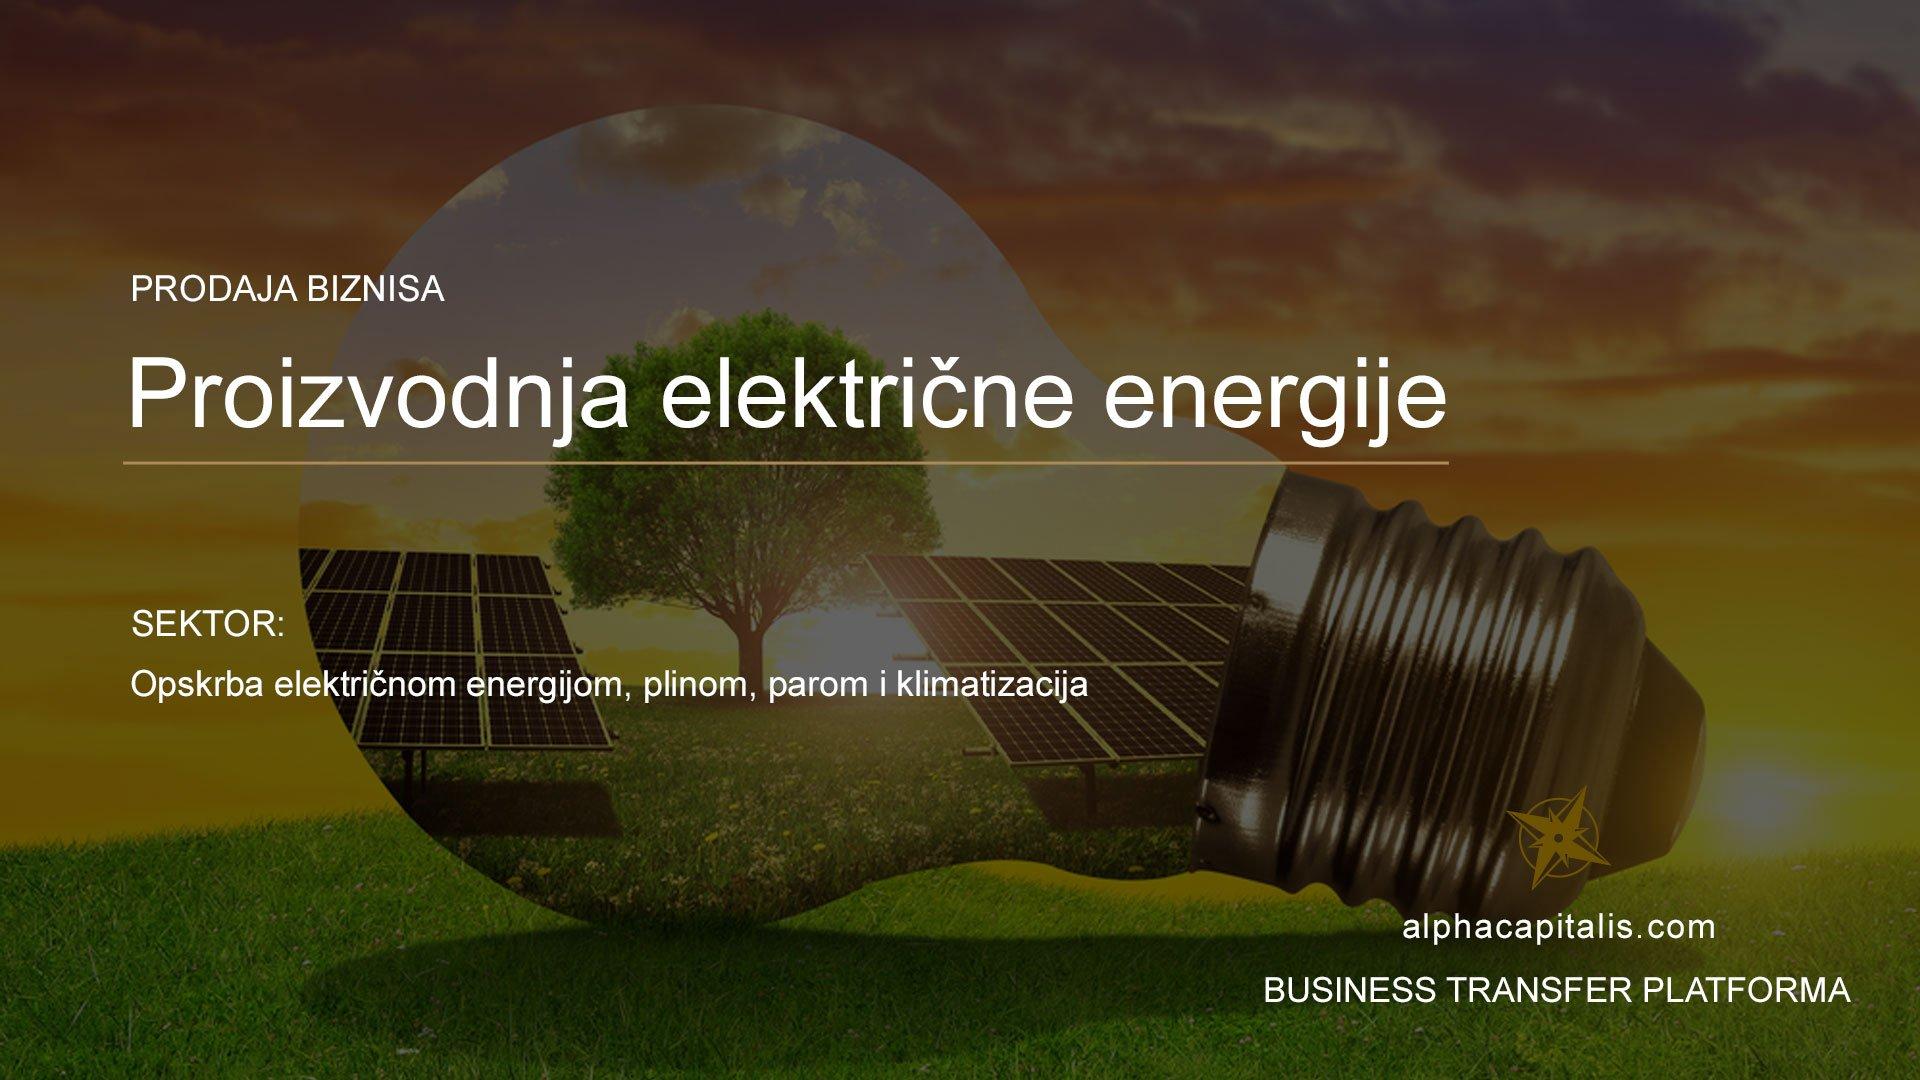 BTP-prodaja-biznisa-električna-energija